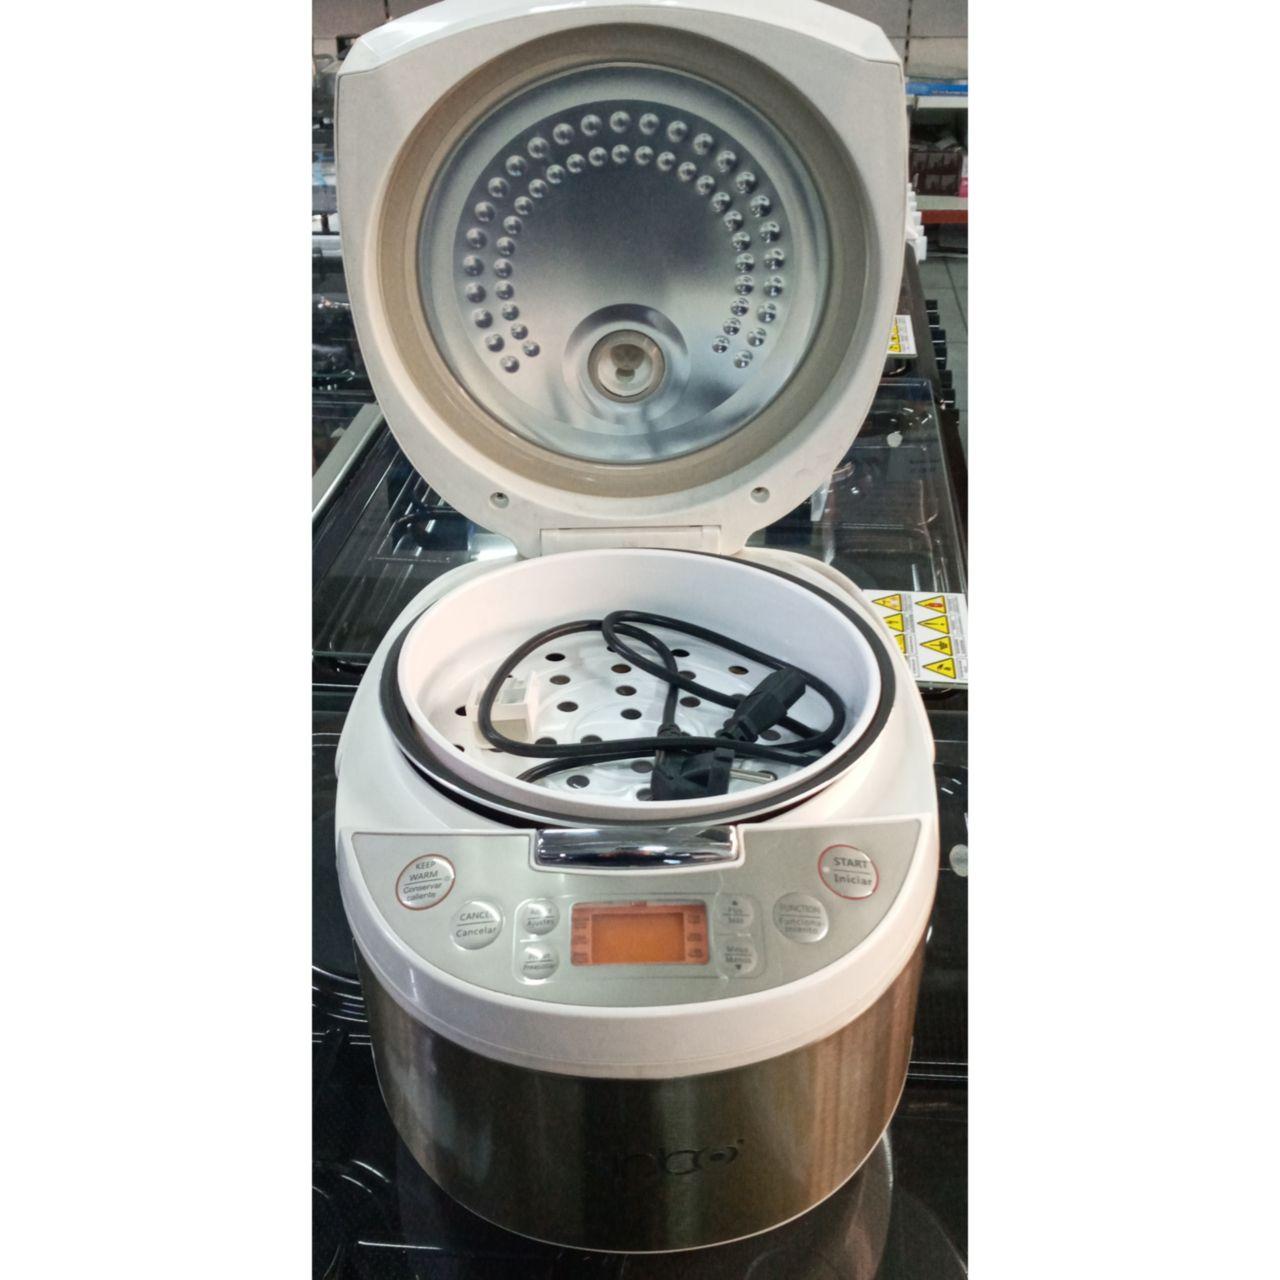 Мультиварка Simbo объемом 5 литров